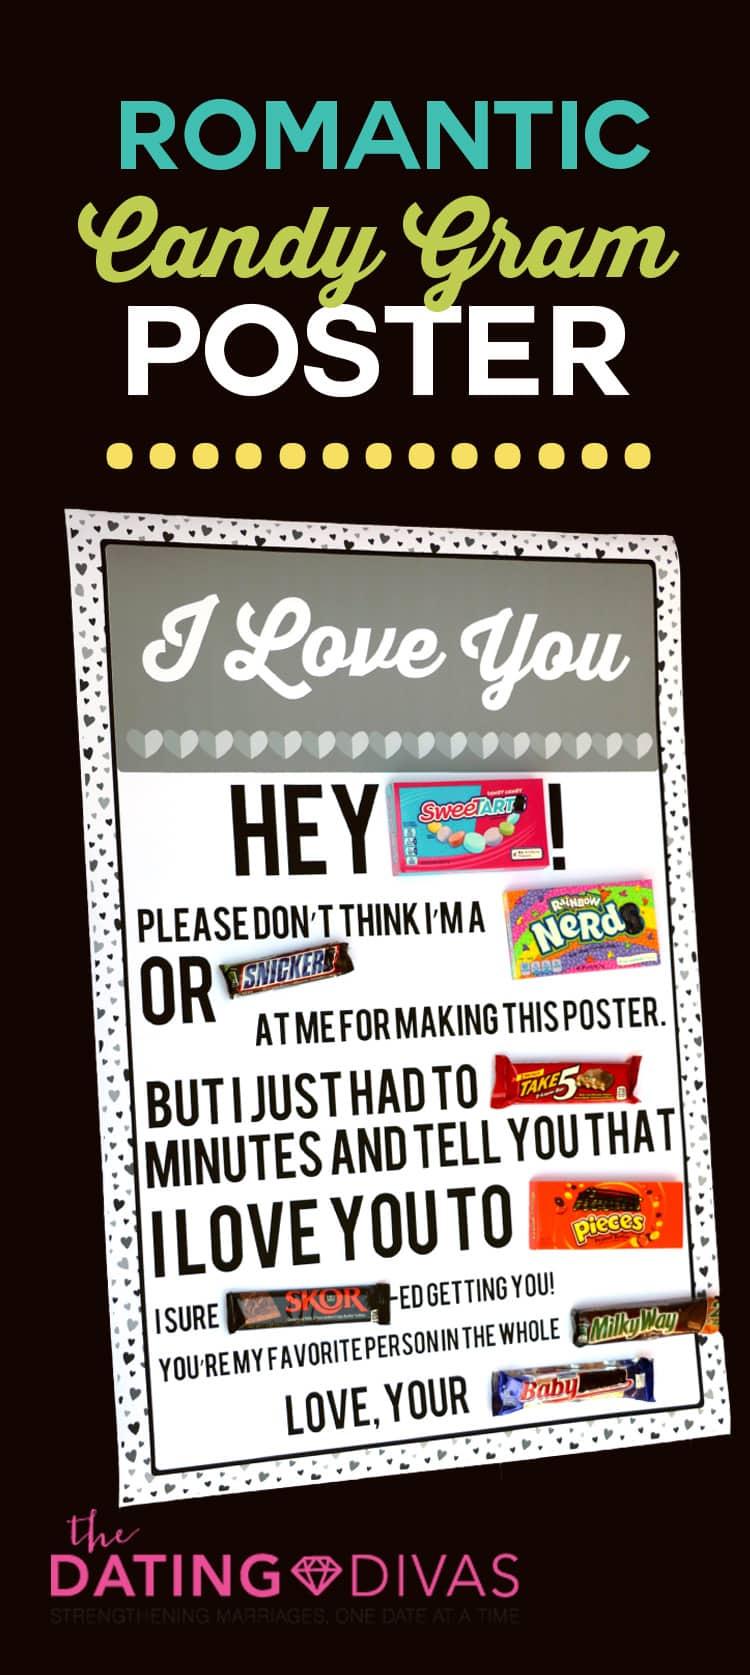 Romantic Candy Gram Poster